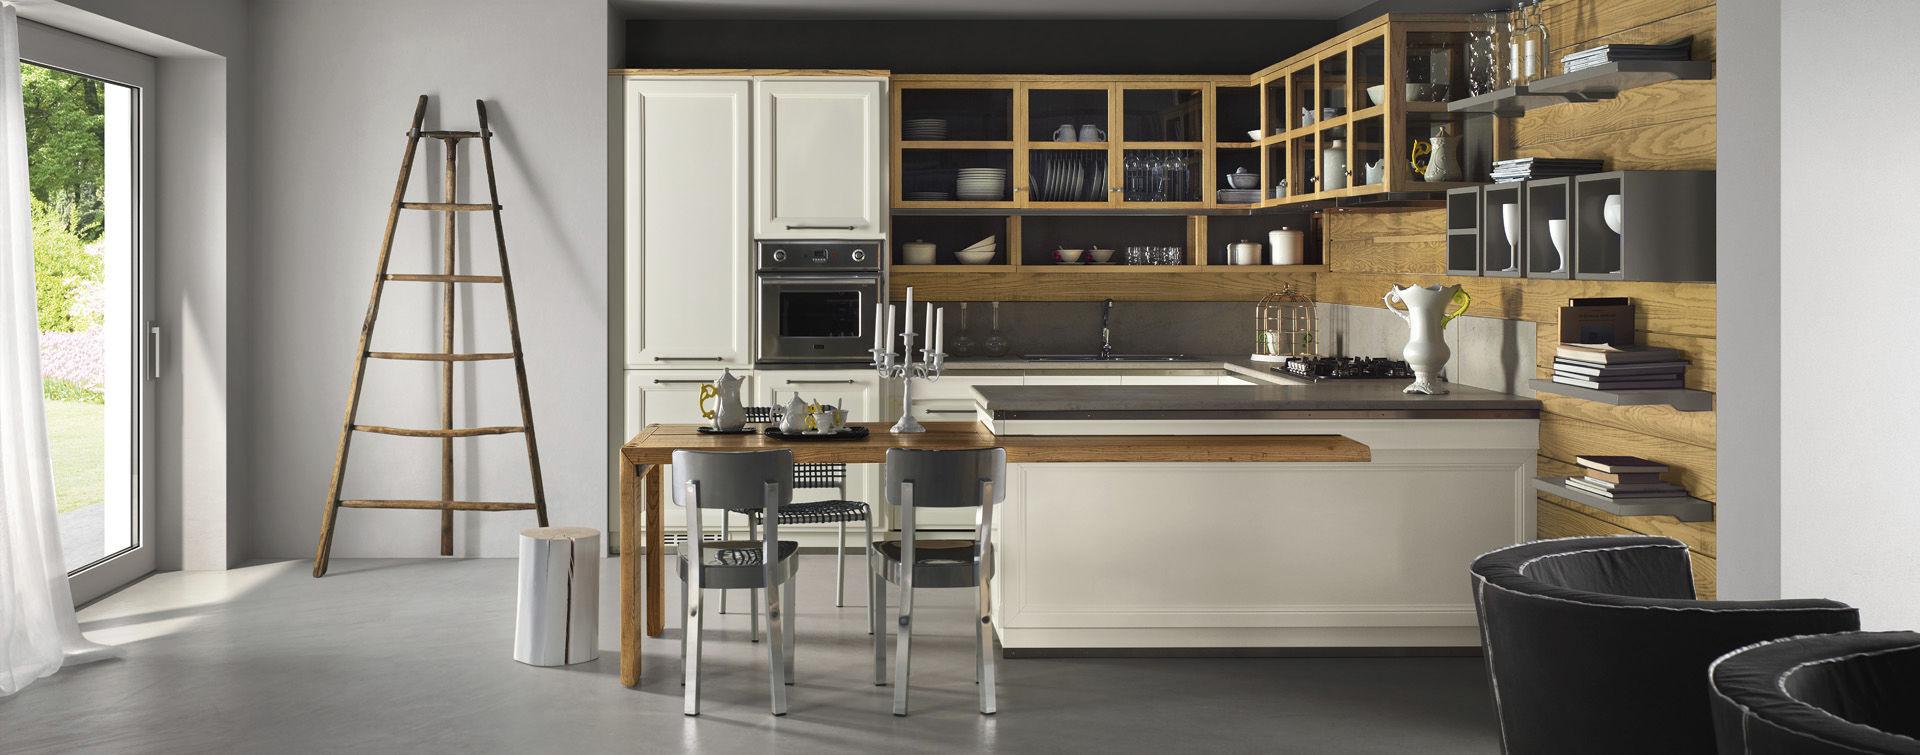 Cucina moderna / in legno / a U / laccata - LIVING DESIGN - L\'OTTOCENTO